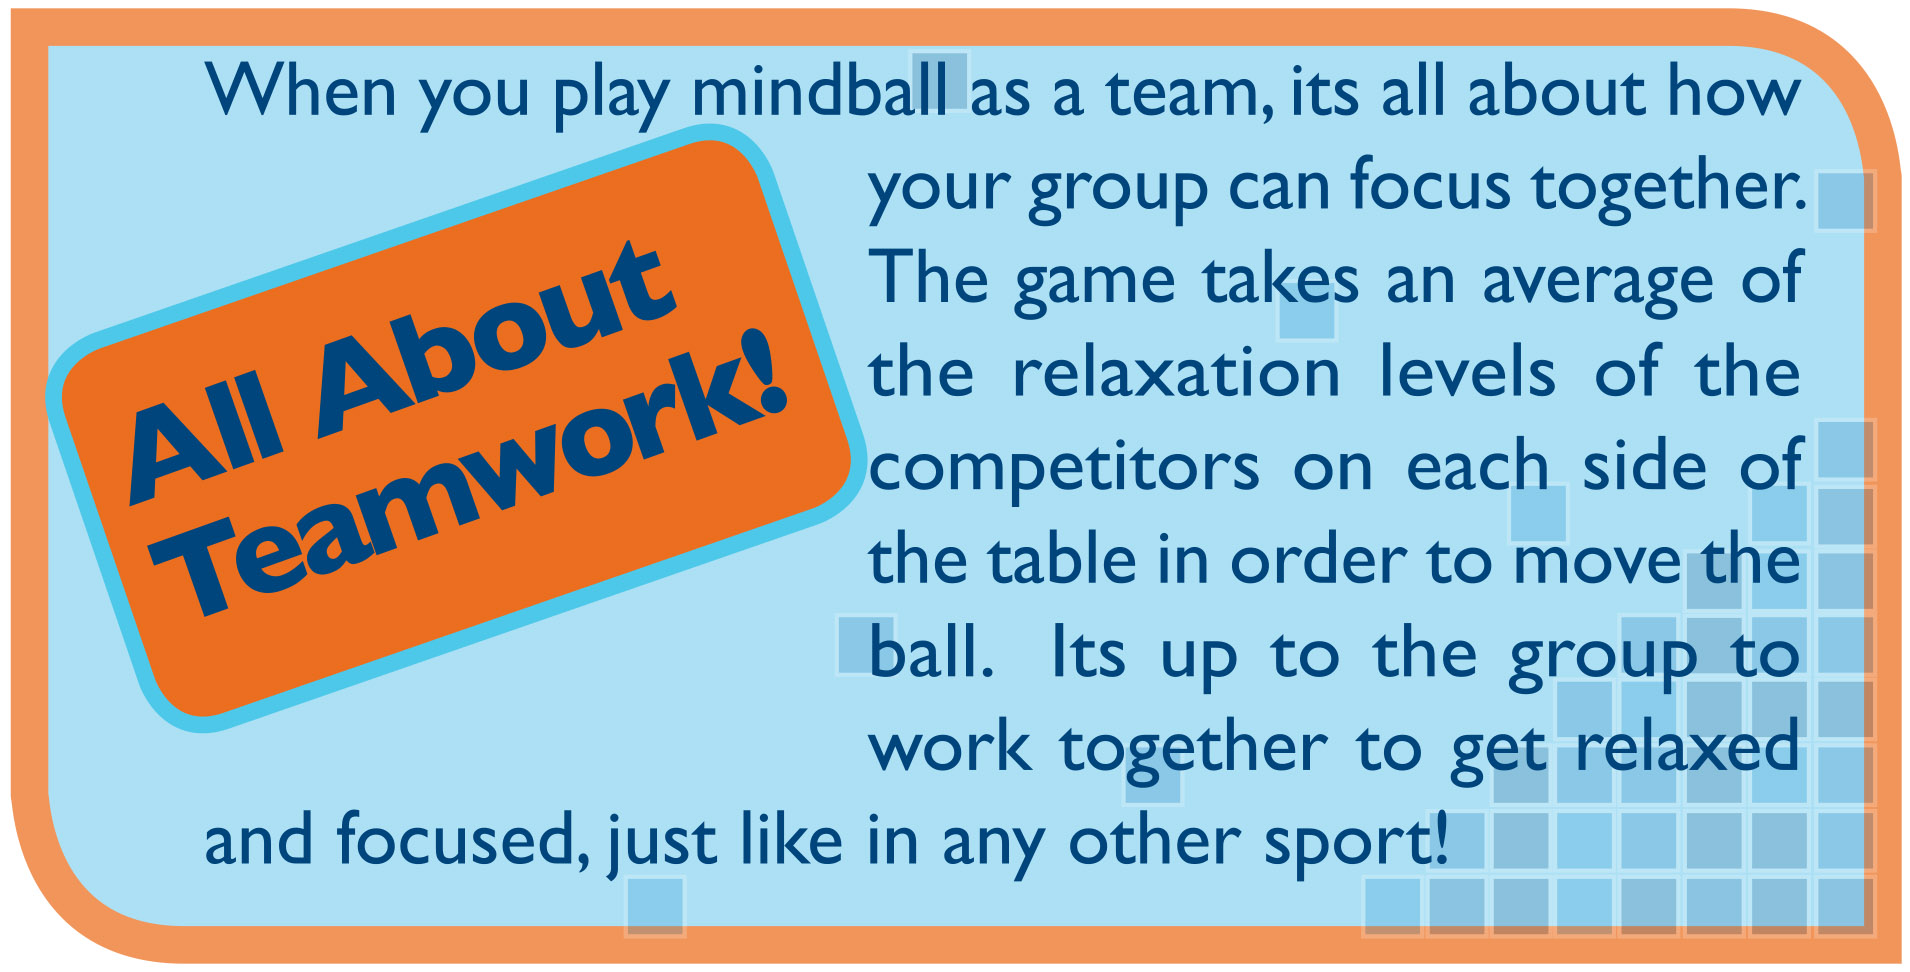 Mindball-2.jpg